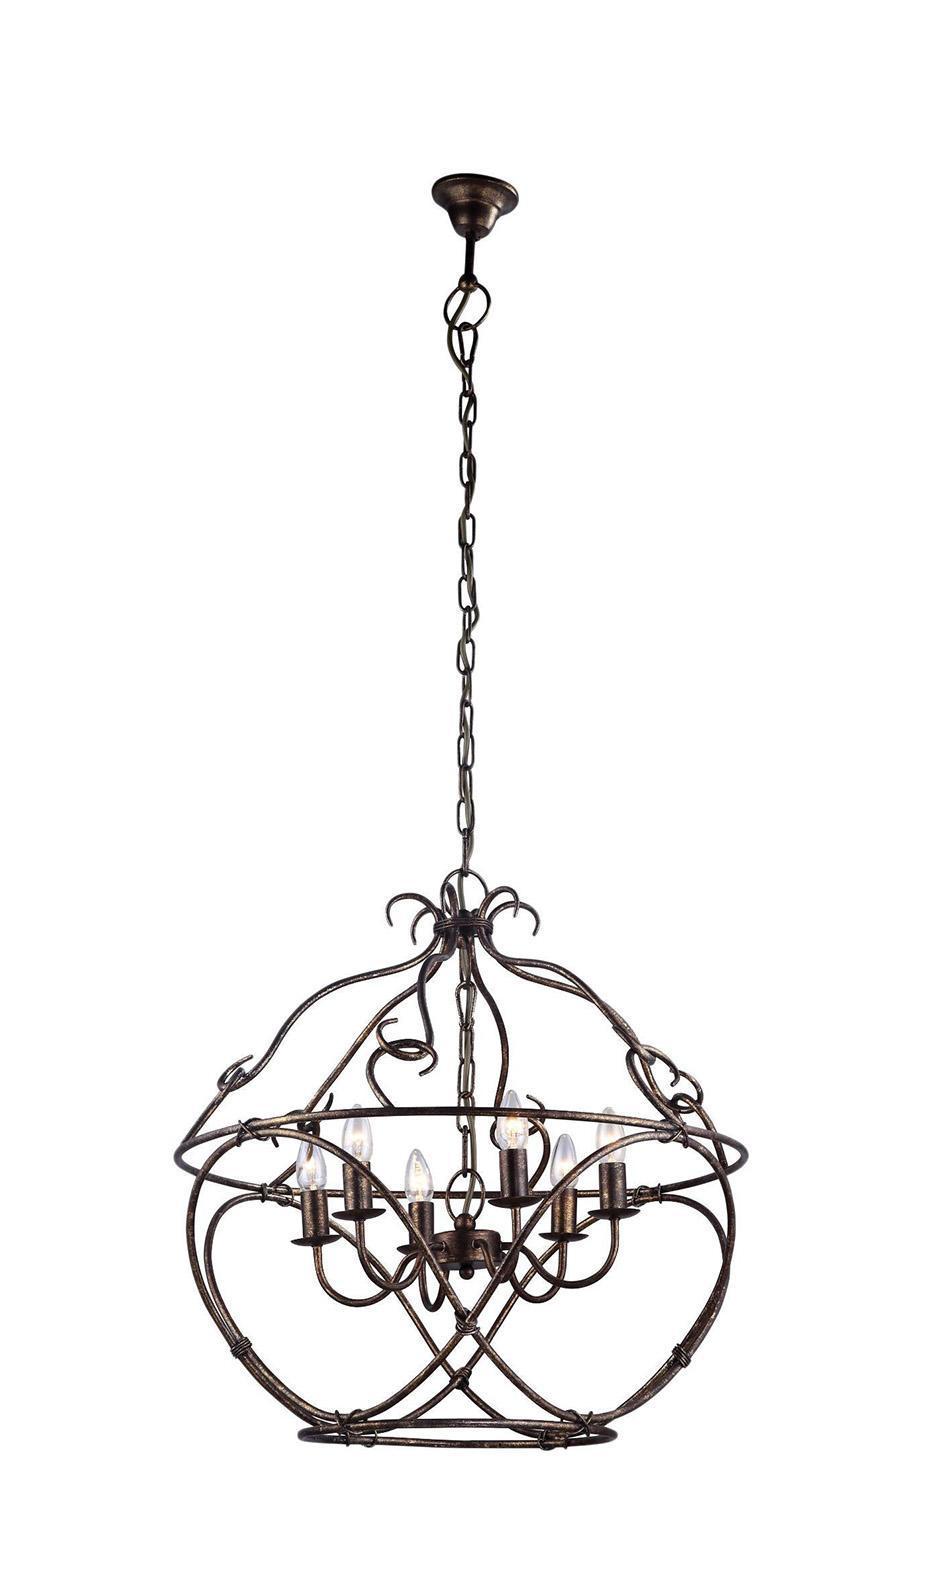 Светильник подвесной Arte lamp A8960sp-6ga arte lamp a8960sp 3ga